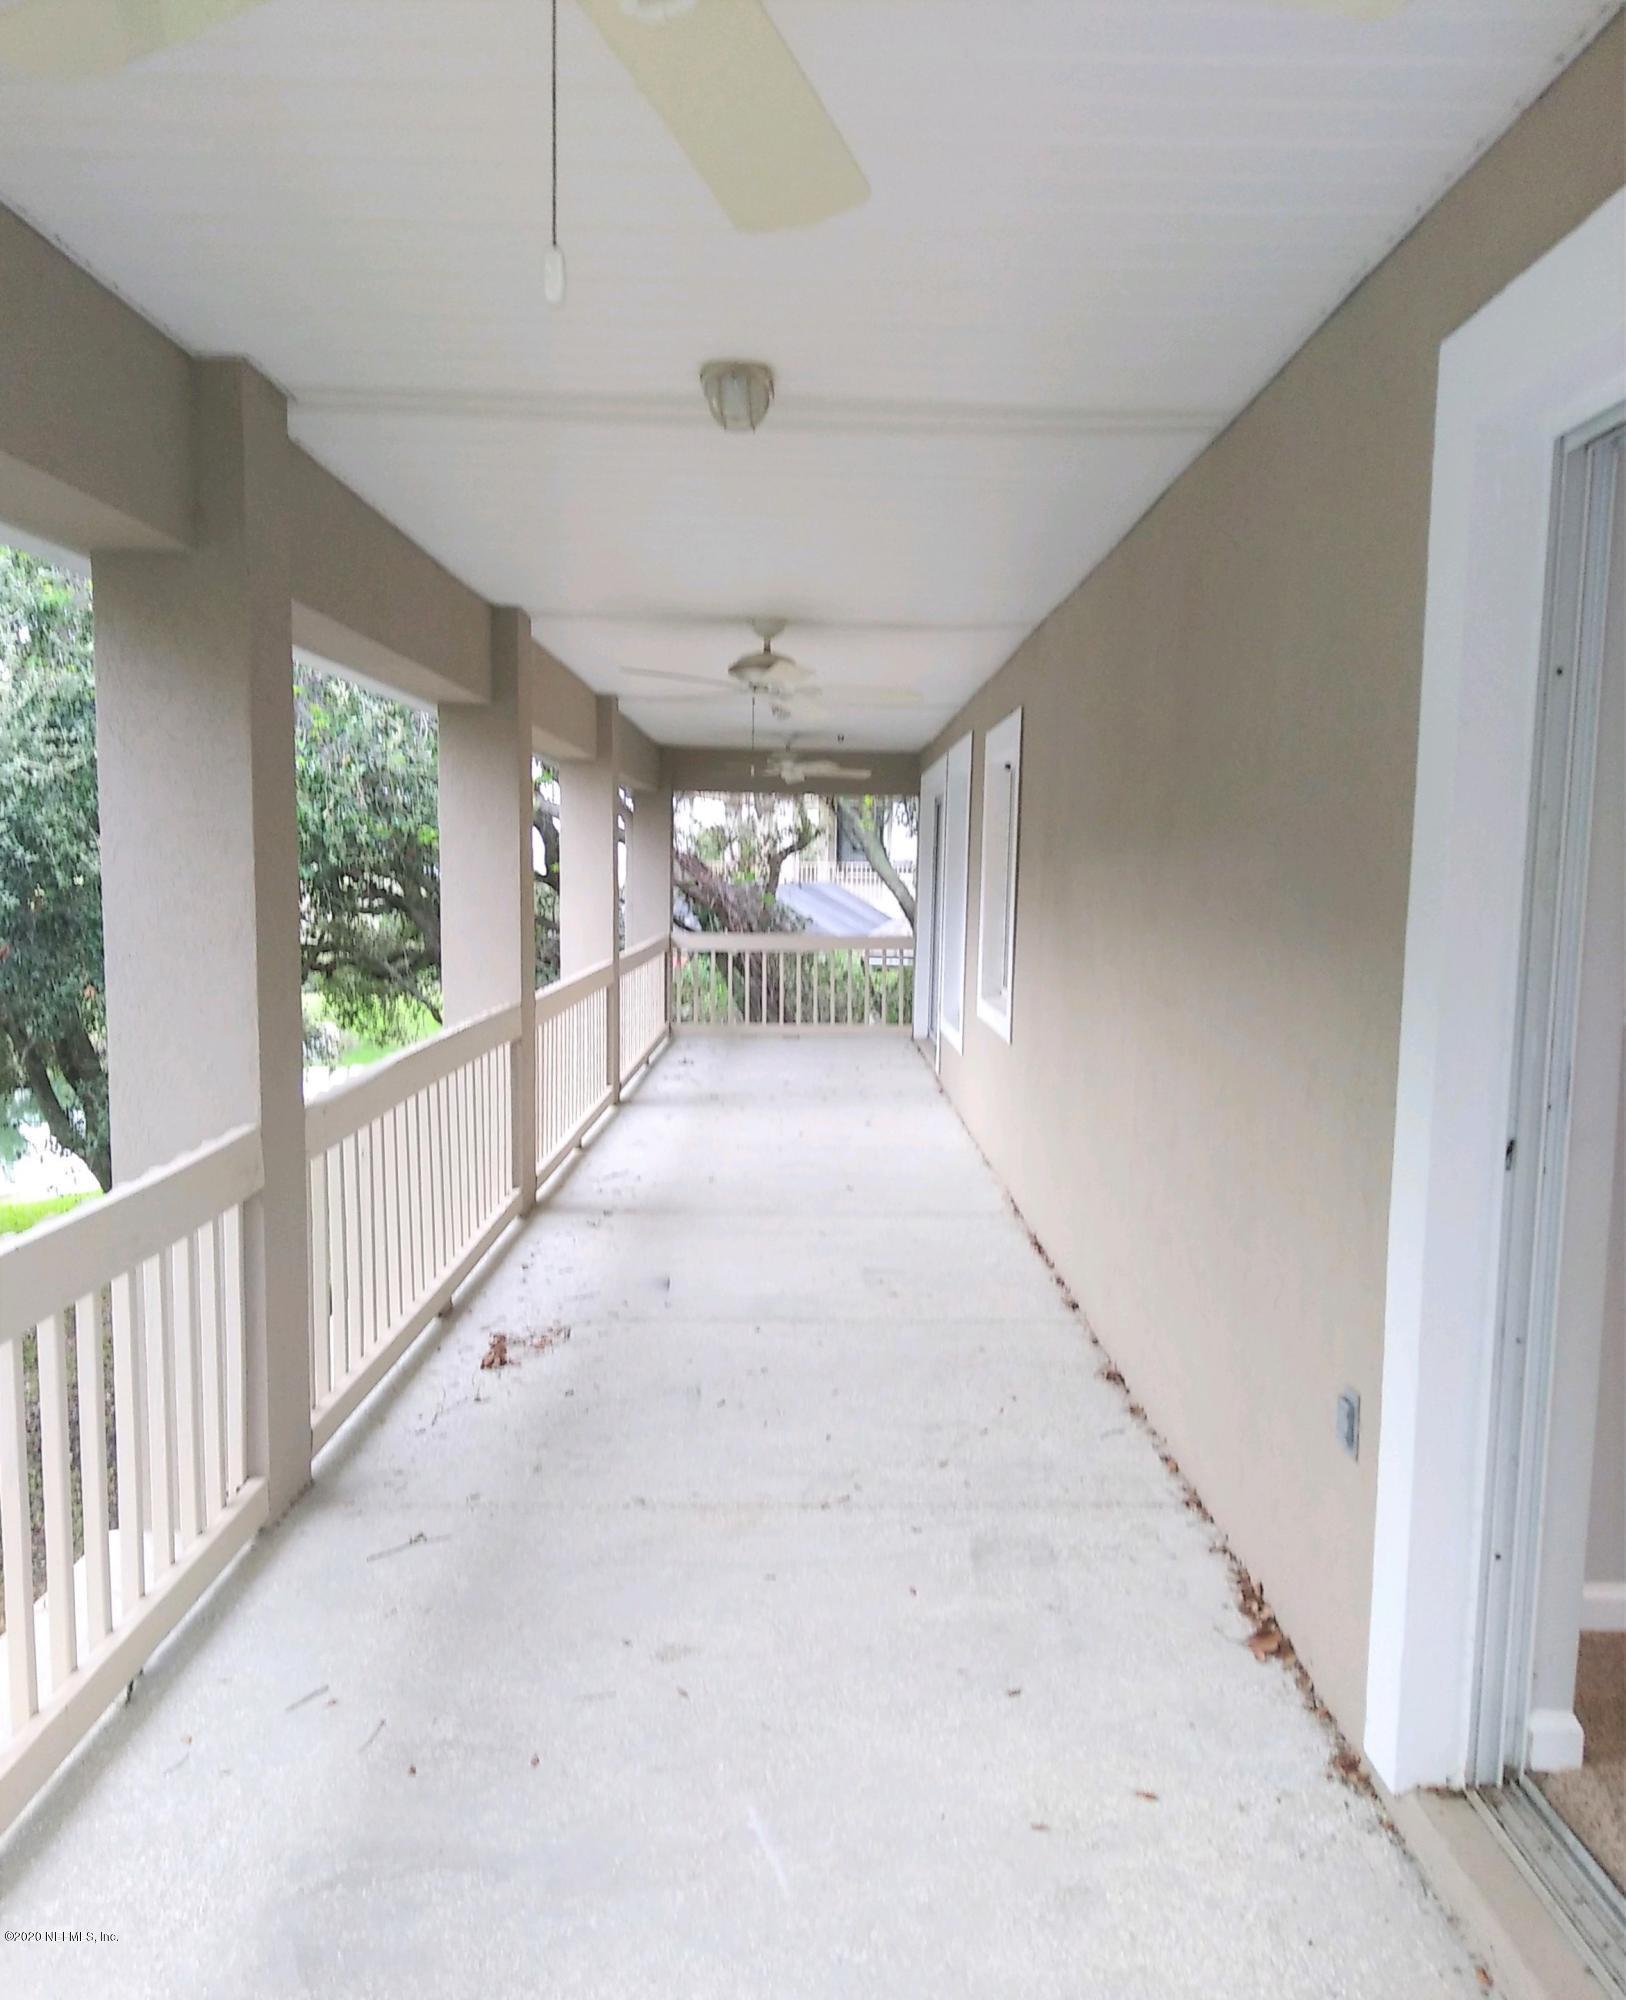 121 BEACHSIDE, PONTE VEDRA BEACH, FLORIDA 32082, 4 Bedrooms Bedrooms, ,3 BathroomsBathrooms,Residential,For sale,BEACHSIDE,1081773